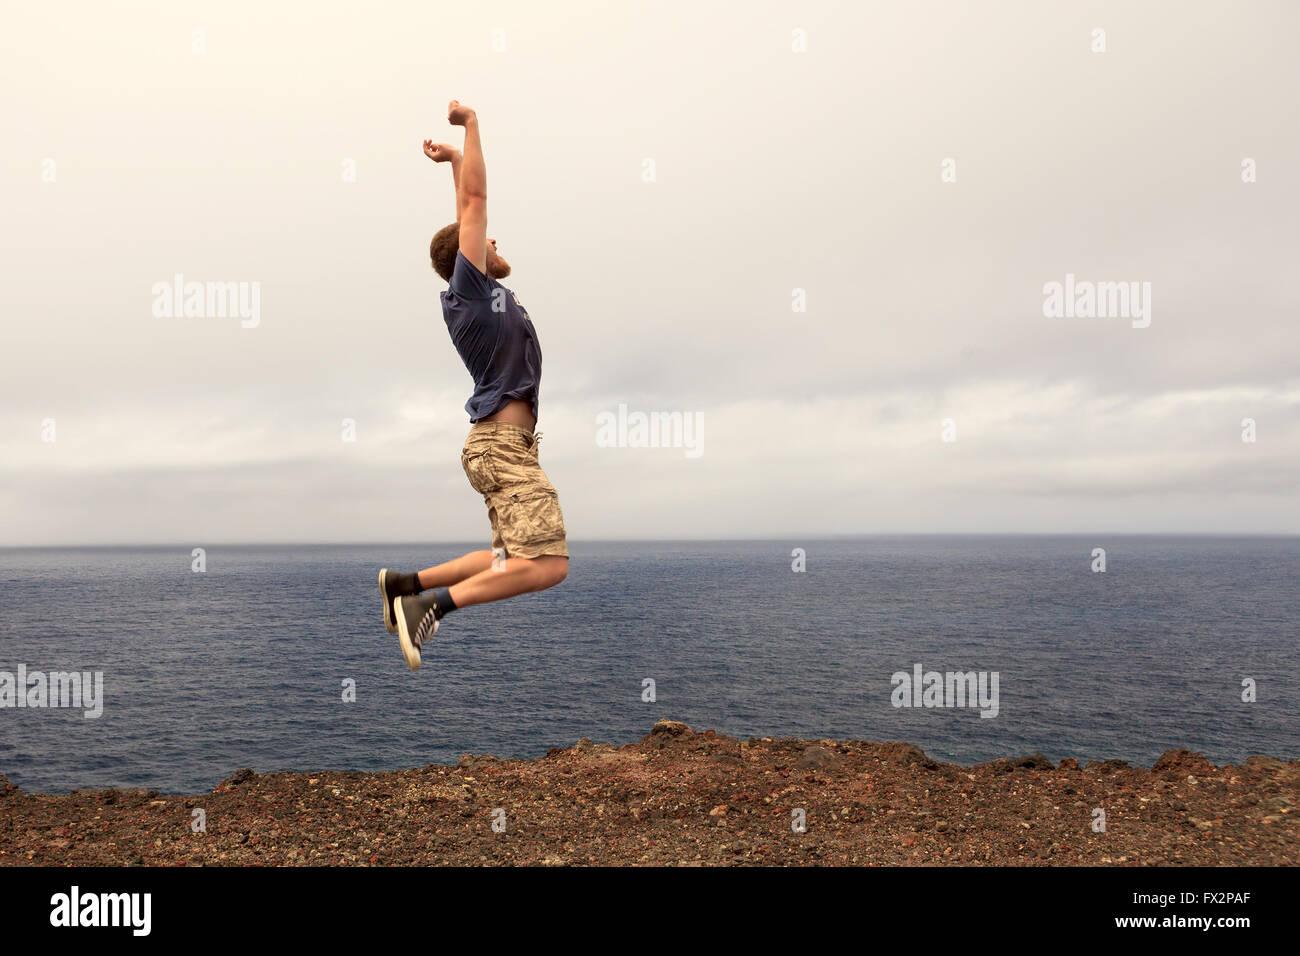 Succès ou win concept - joyeux man jumping outdoor Photo Stock